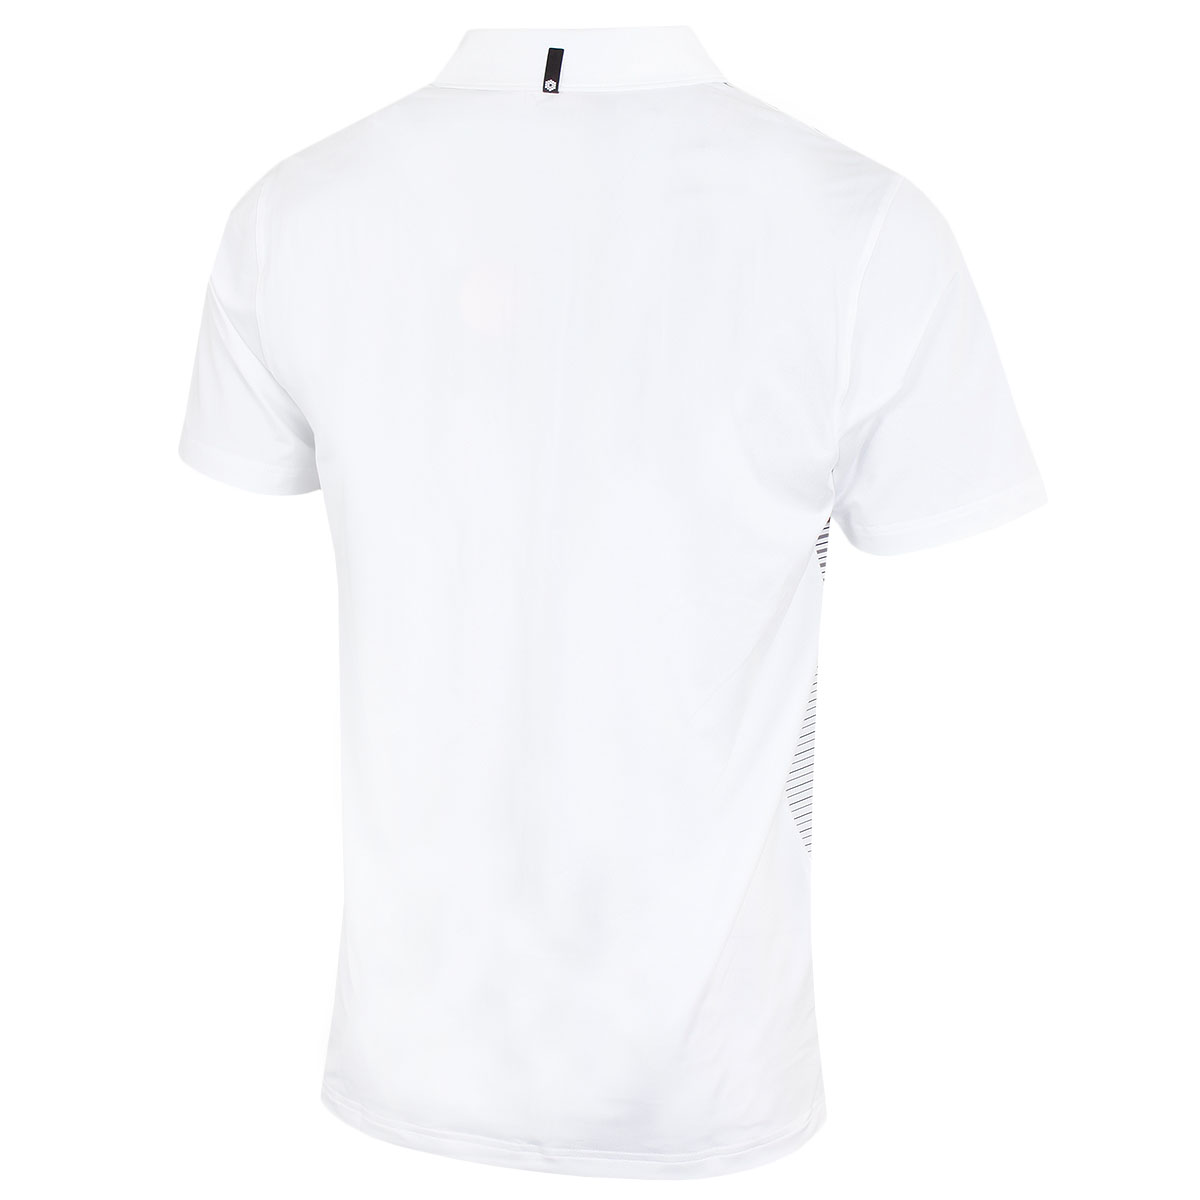 Puma-Golf-Mens-Highlight-Stripe-DryCELL-UPF-40-Stretch-Polo-Shirt thumbnail 6